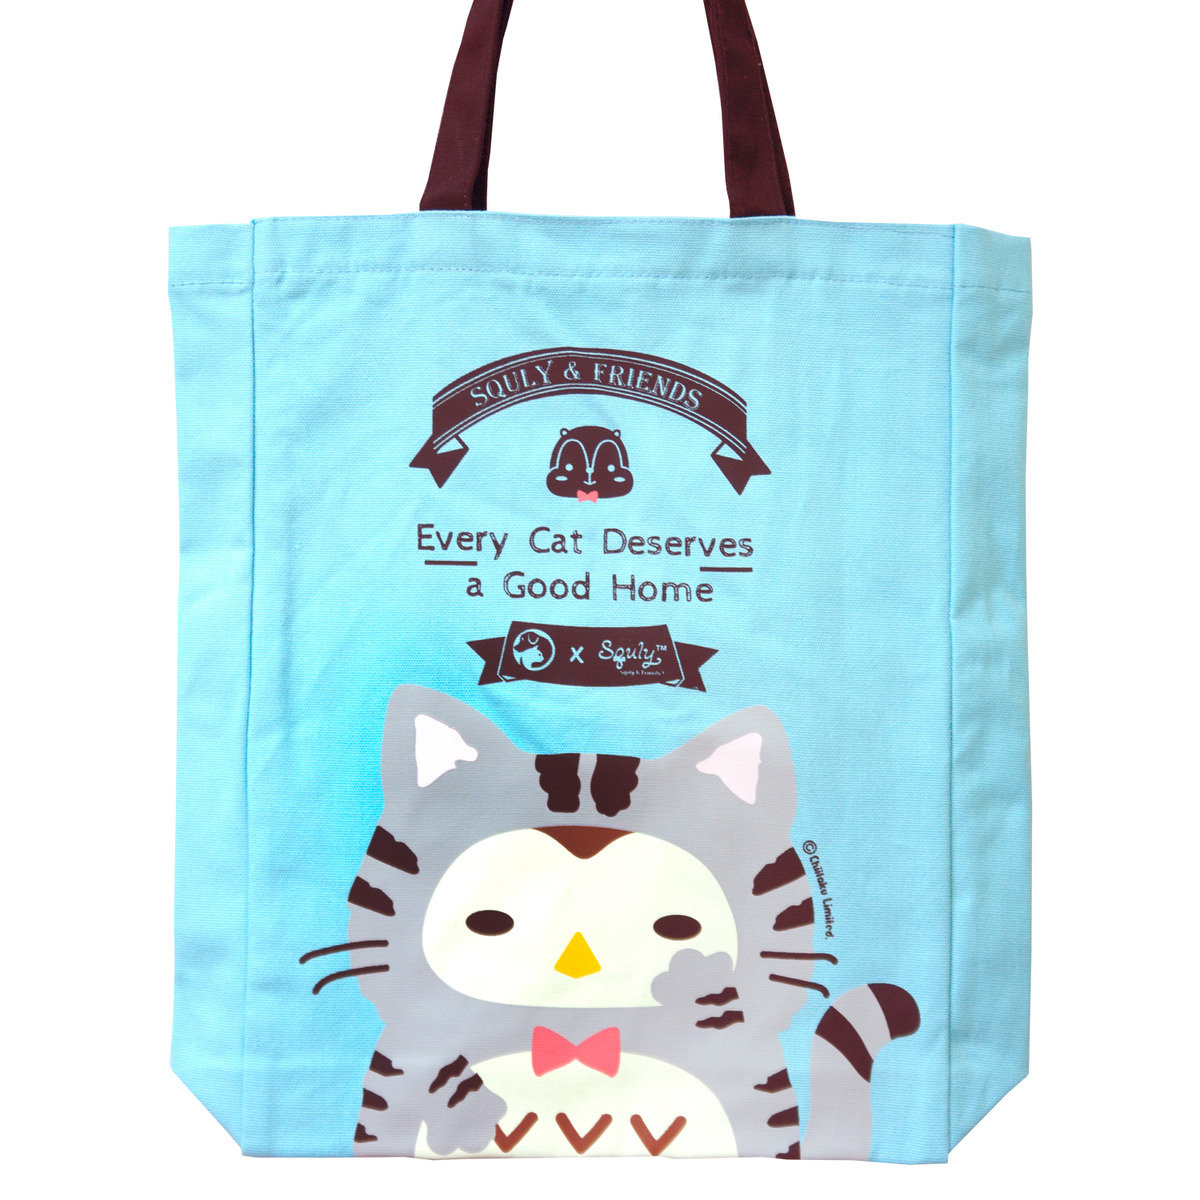 Owlly 帆布手提袋(愛護動物協會特別版 - 貓仔)